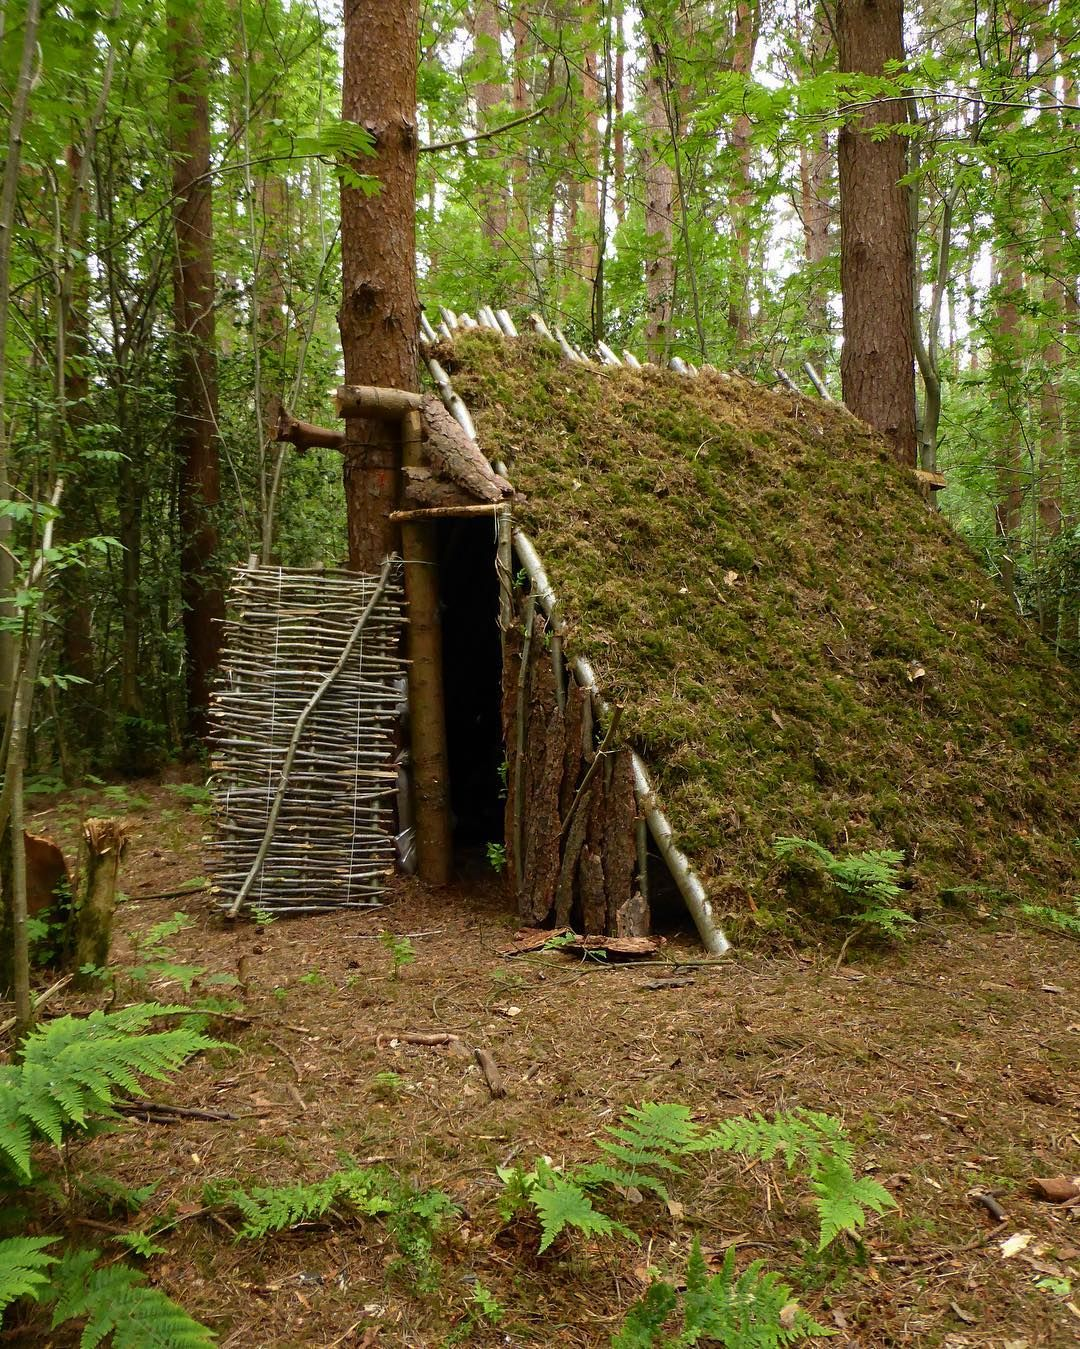 Bushcraft Survival Skills: Pin By Mark Sullivan-WellnessCoach On Survival